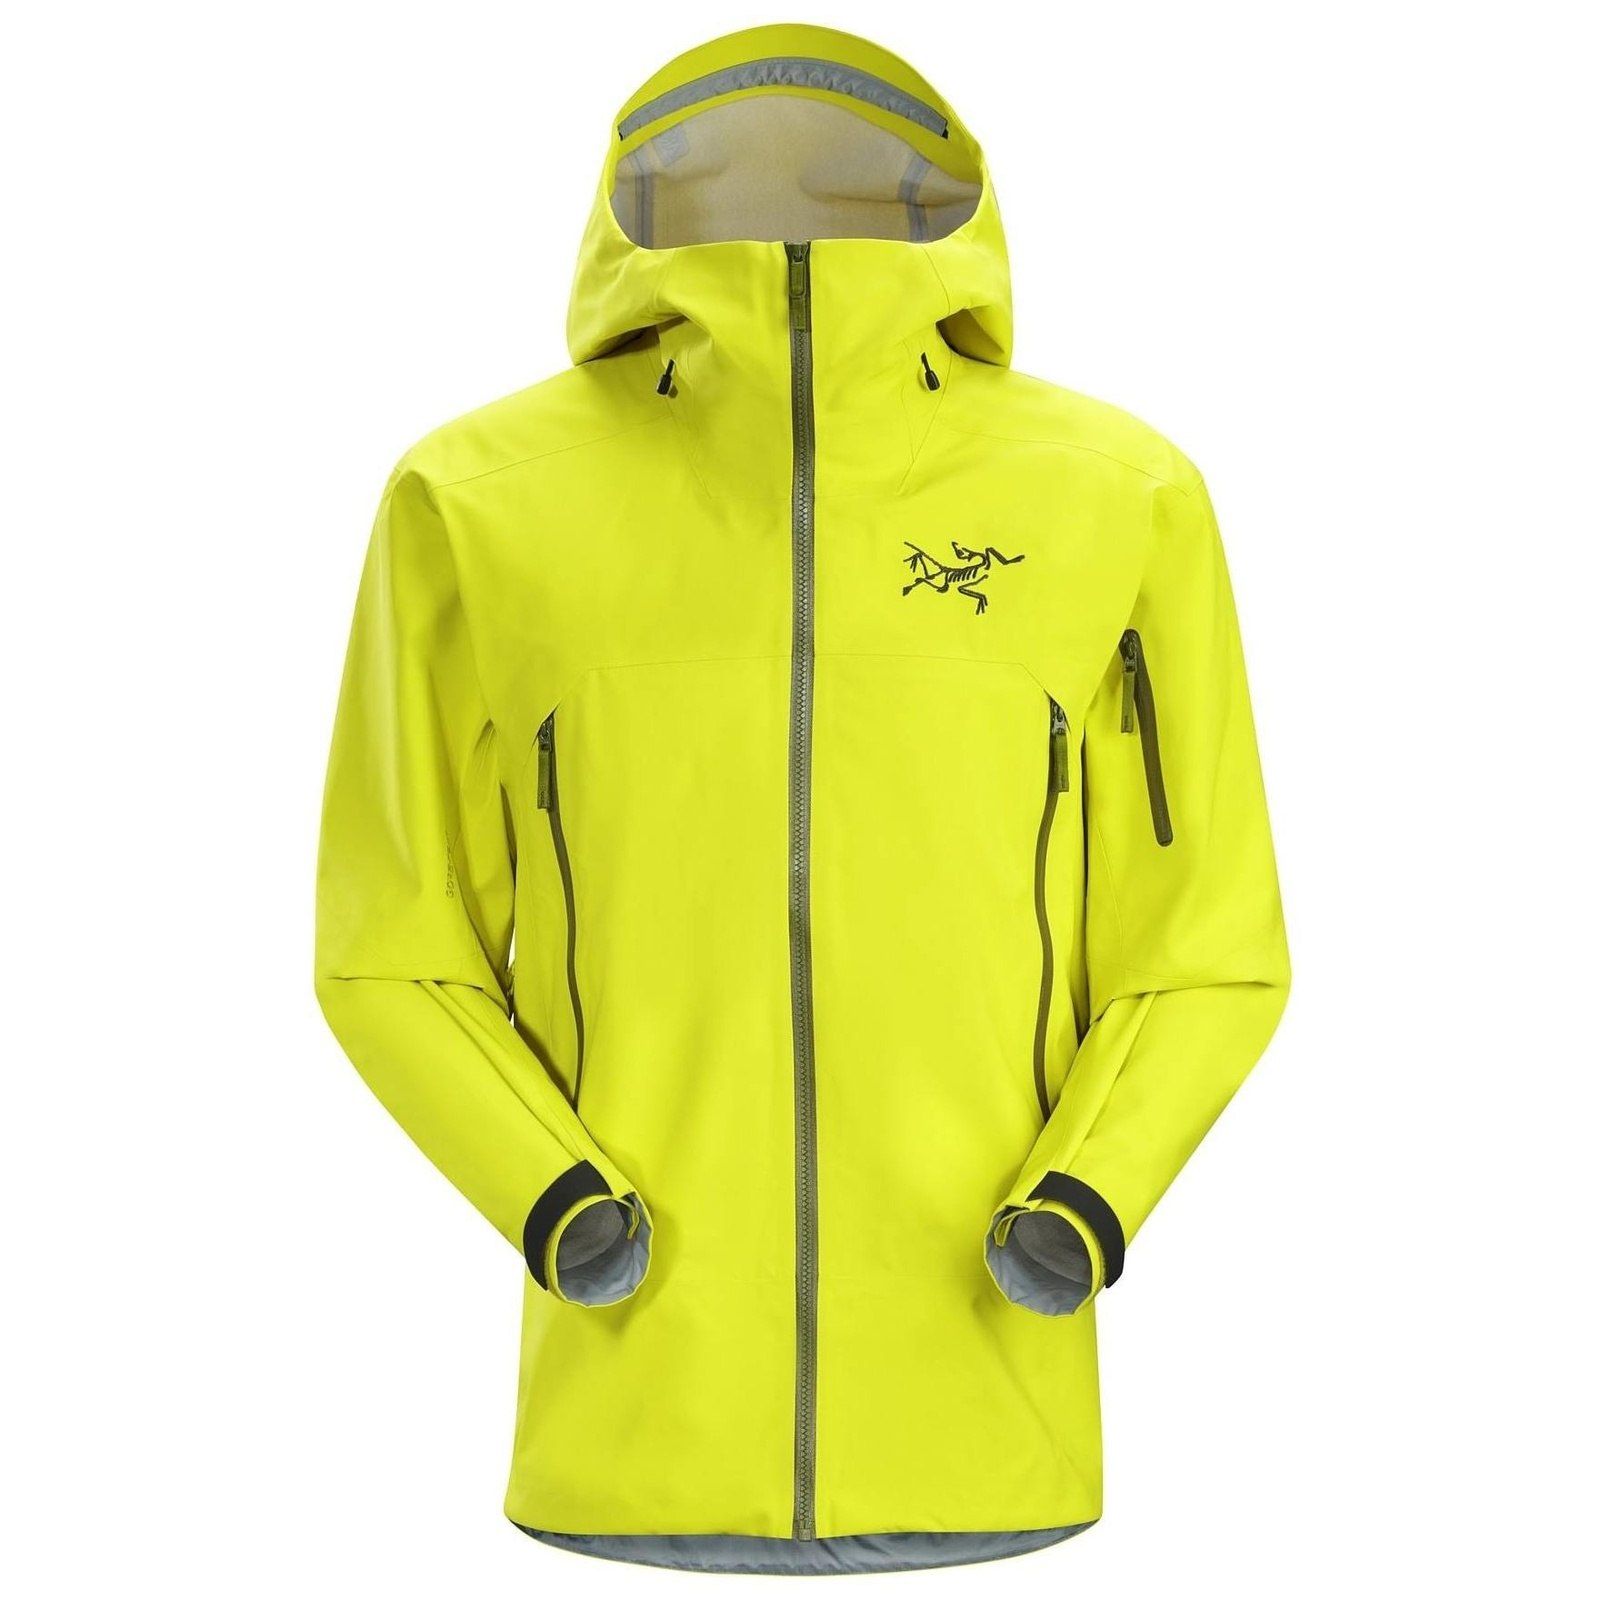 6fd1876960 Arc'teryx Men's Sabre Ski Jacket on Sale | Powder7.com